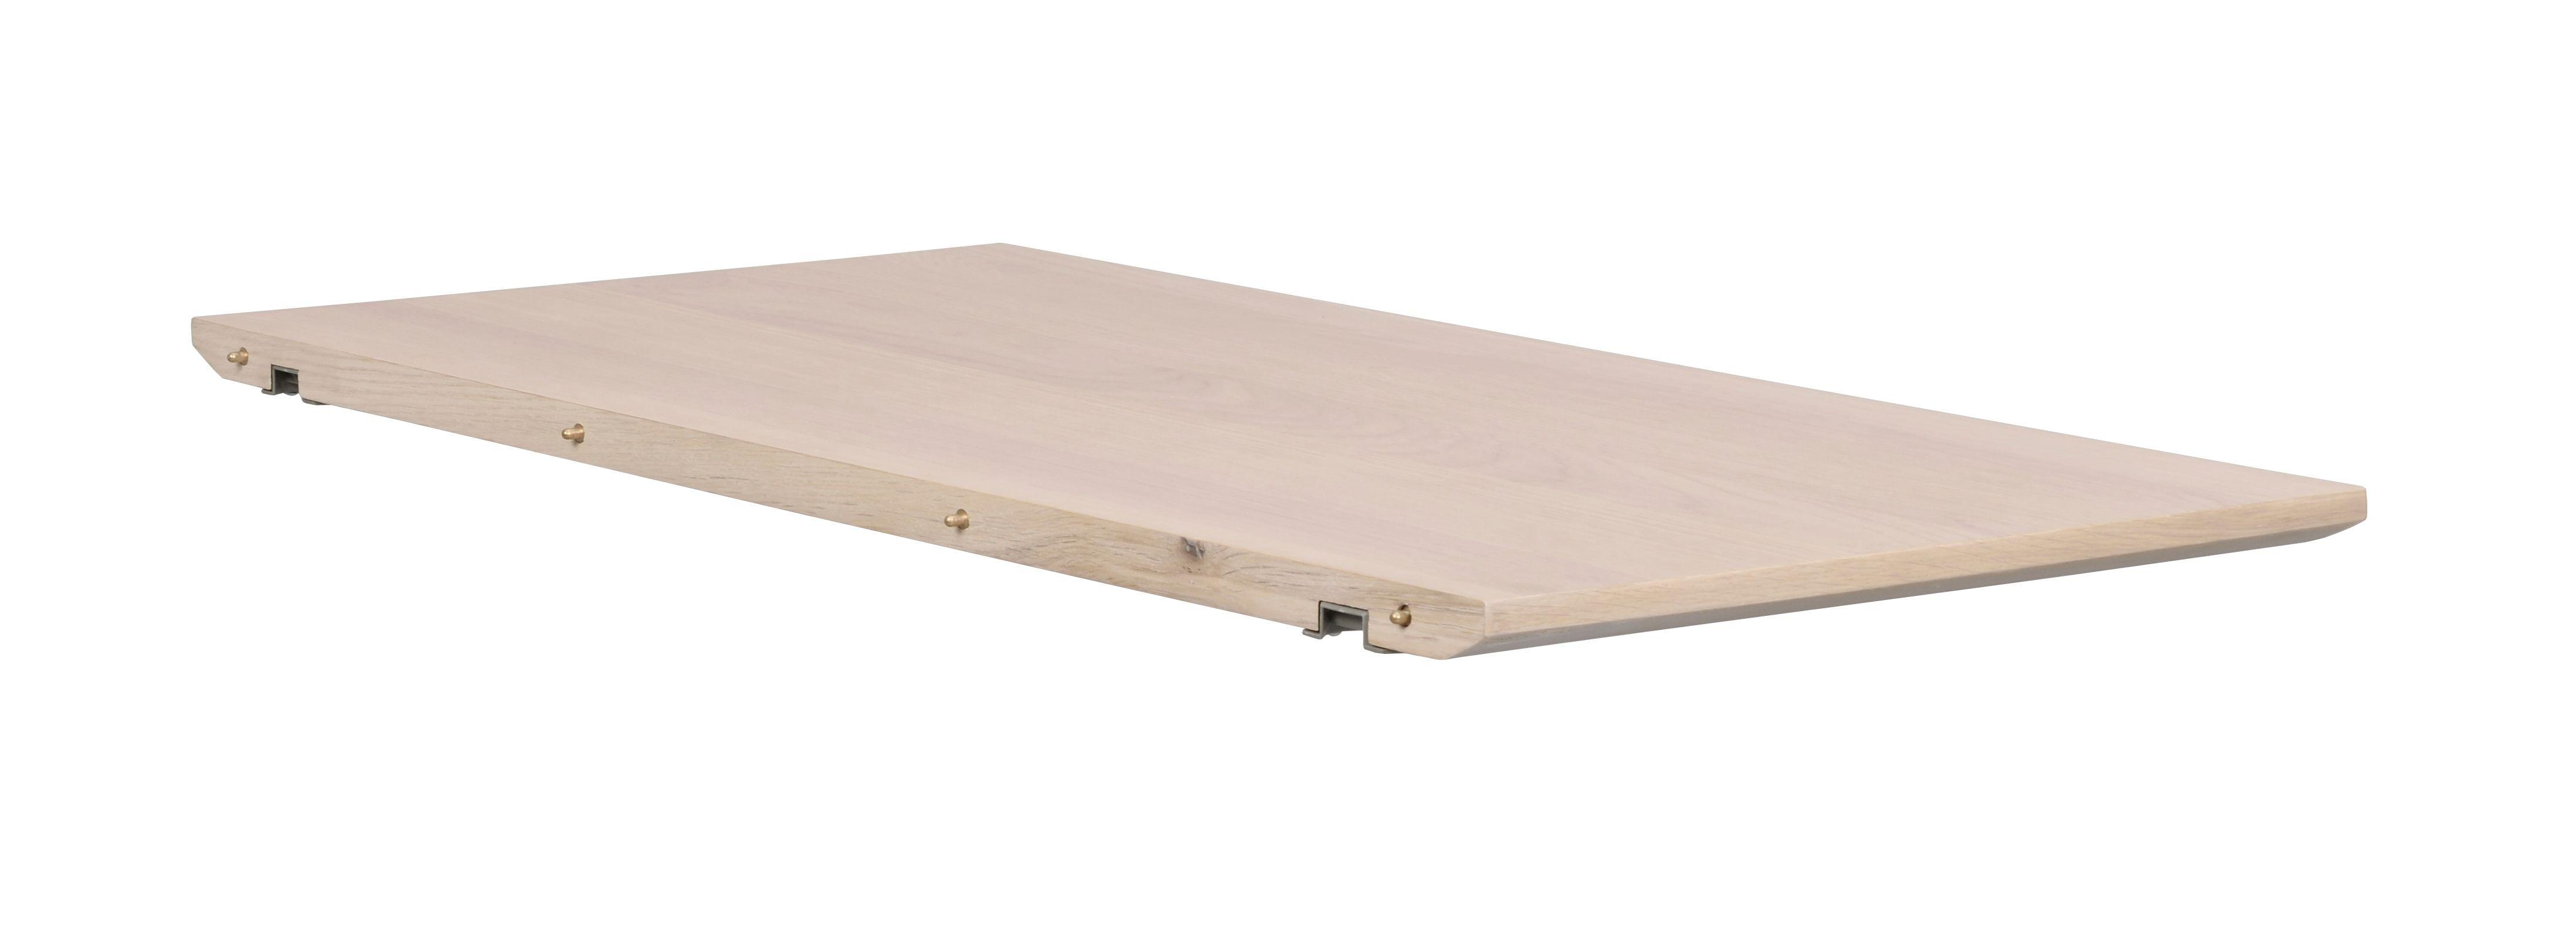 DAWSONE 160 cm Dining Table Including Extension Leaf